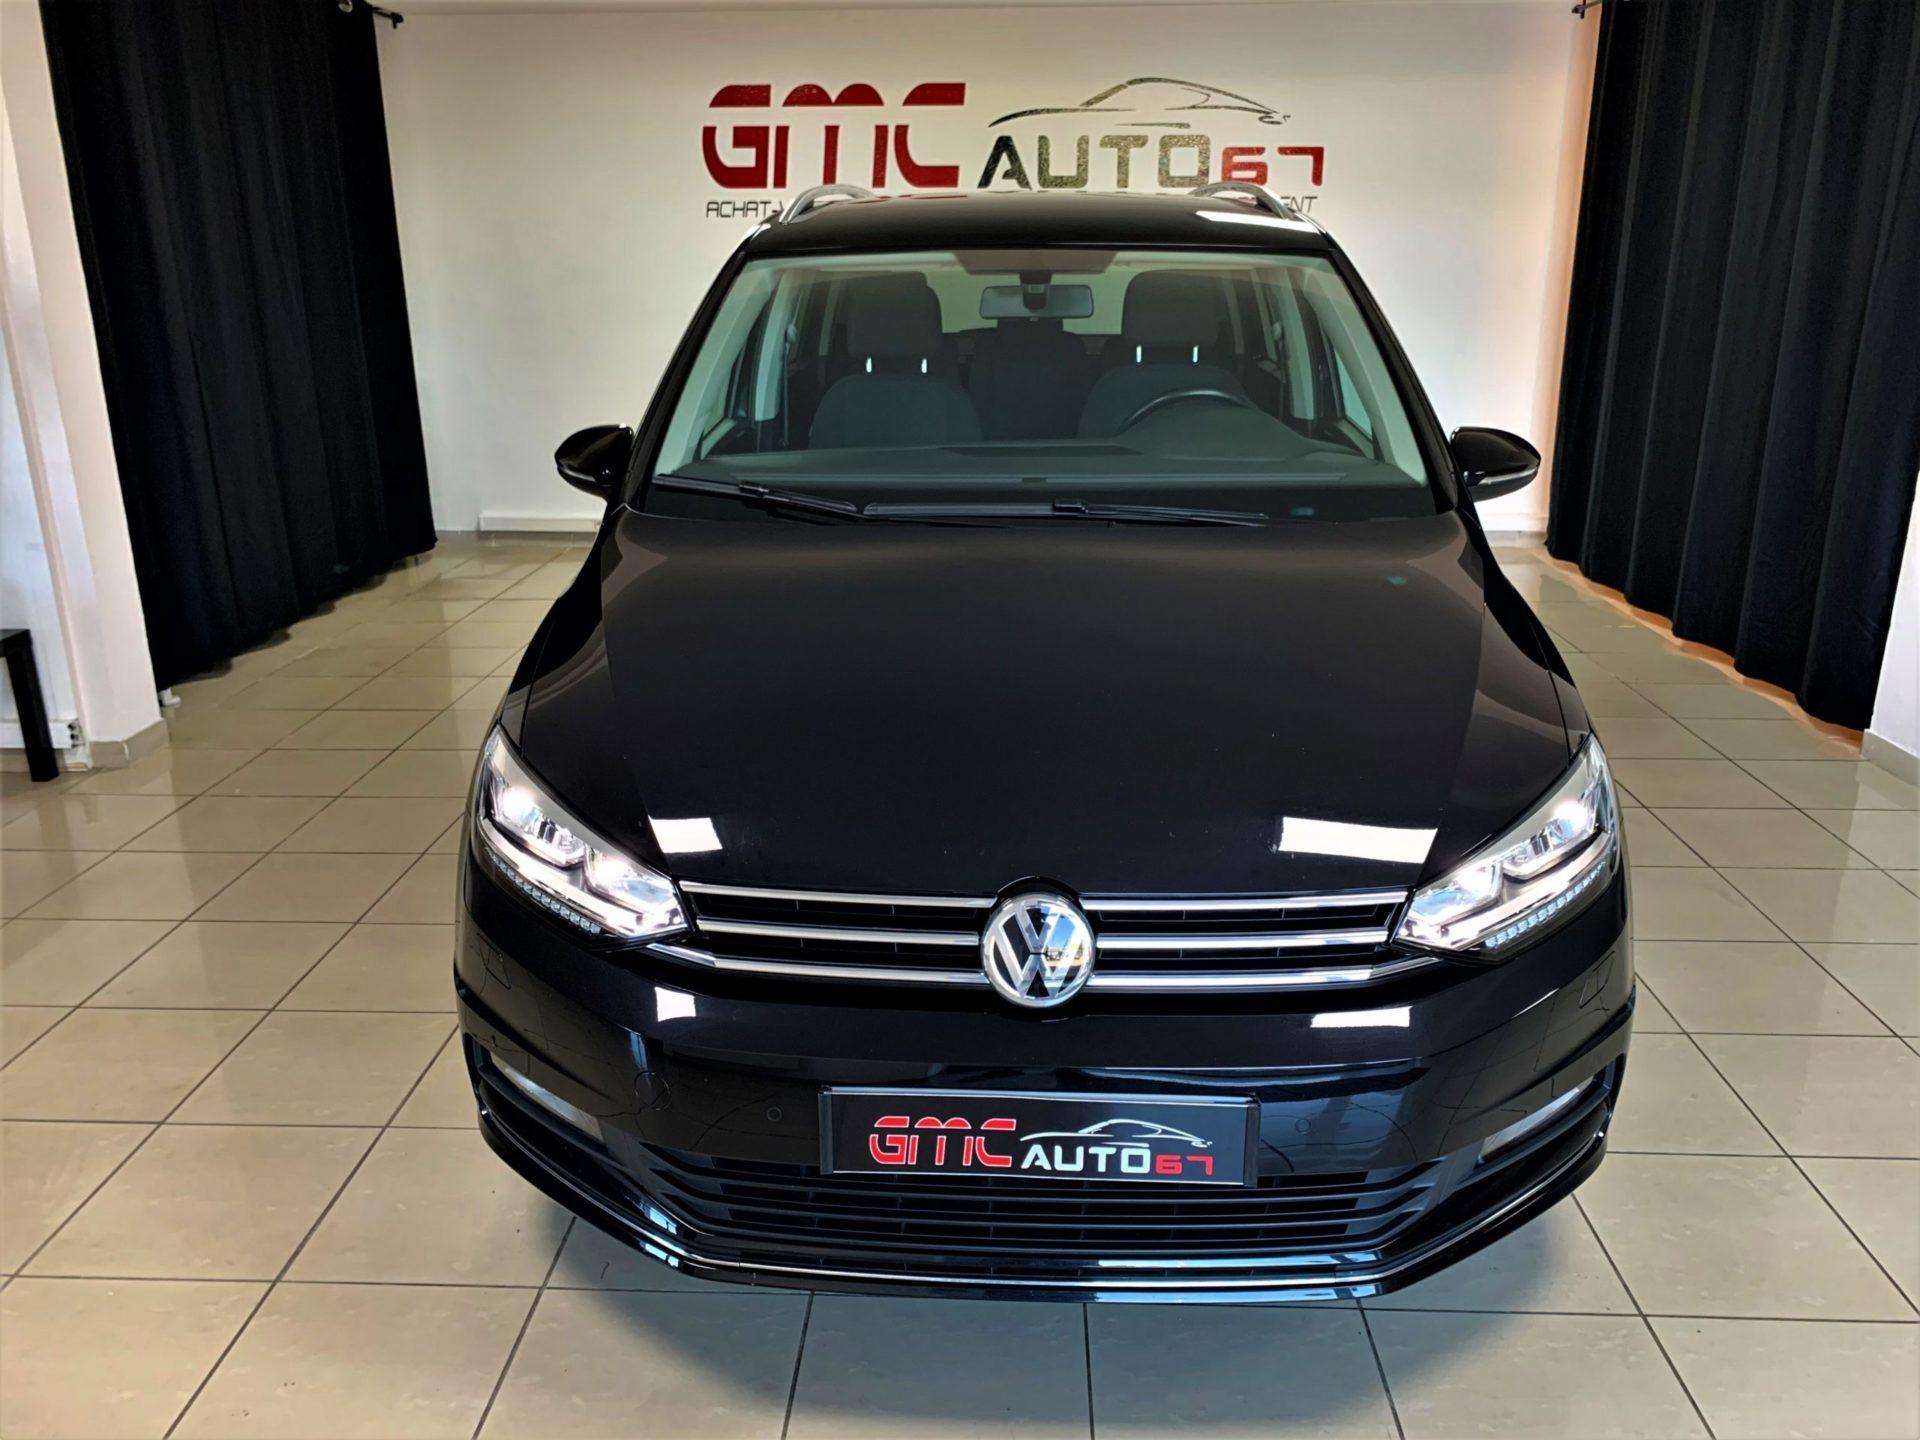 Volkswagen Touran 1.4 TSI 150 BMT 5pl Sound - gmc auto 67